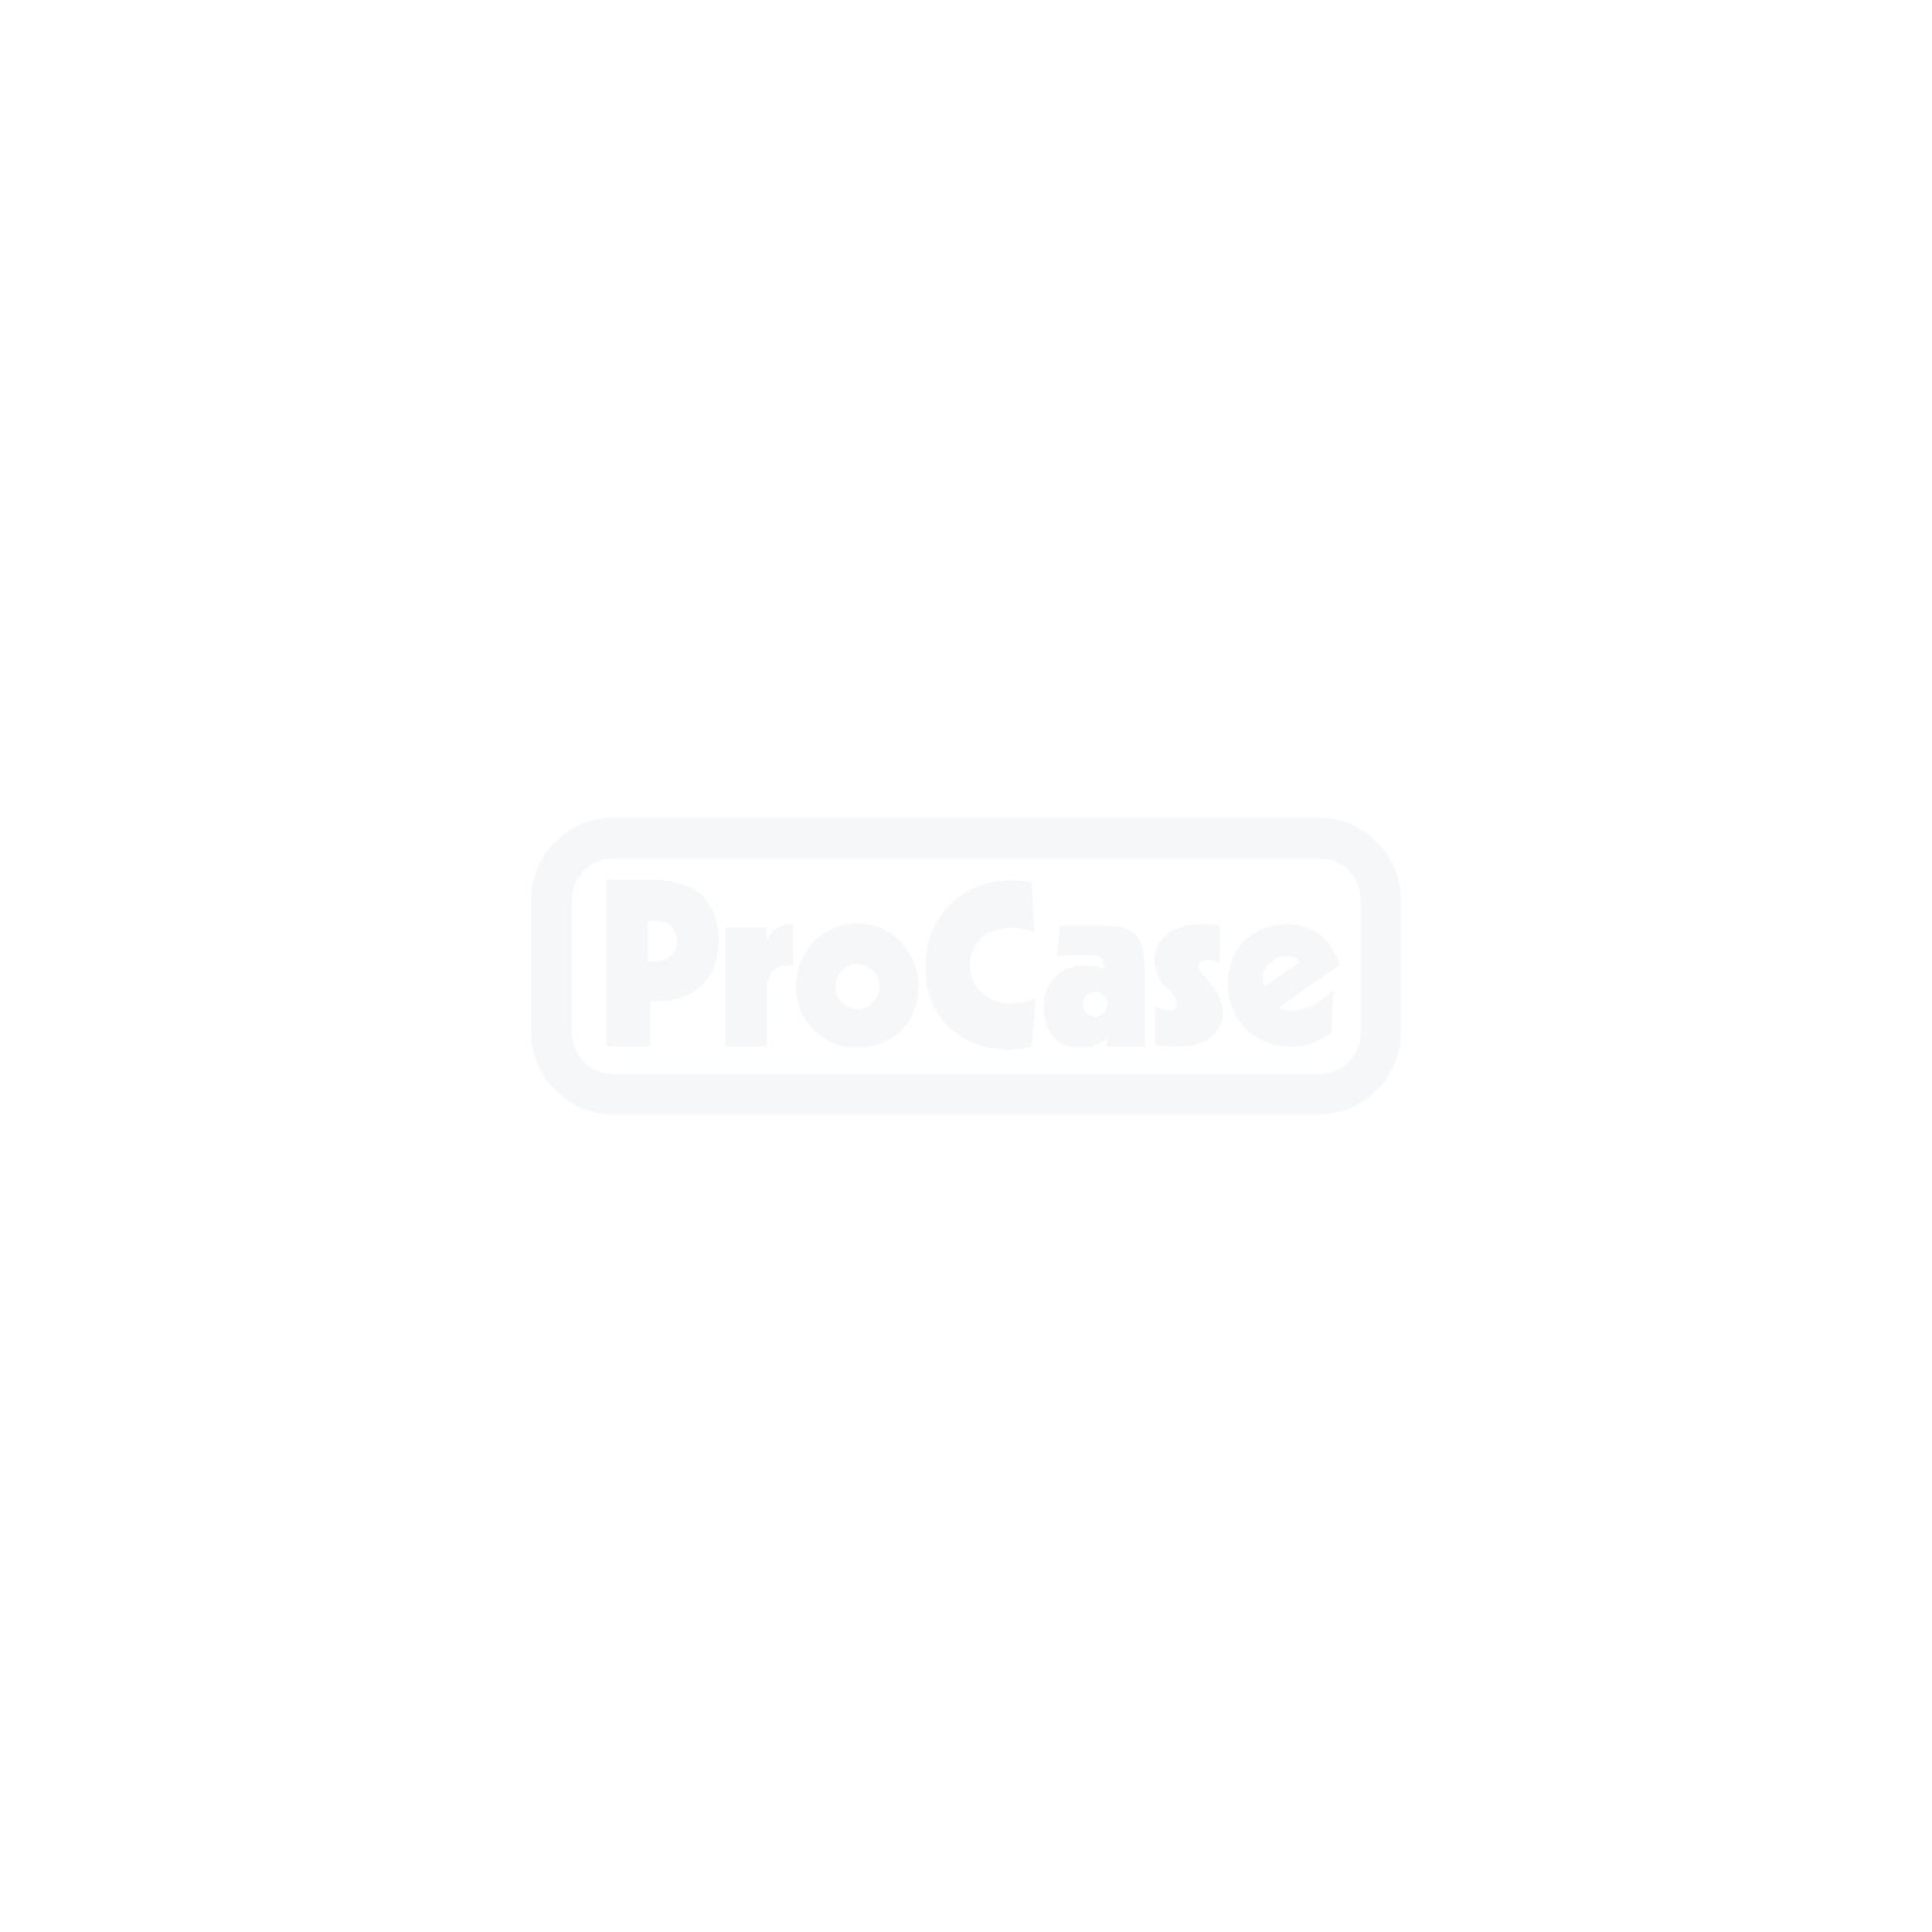 Stapelbox STB1-36 Sperrholzkiste 2